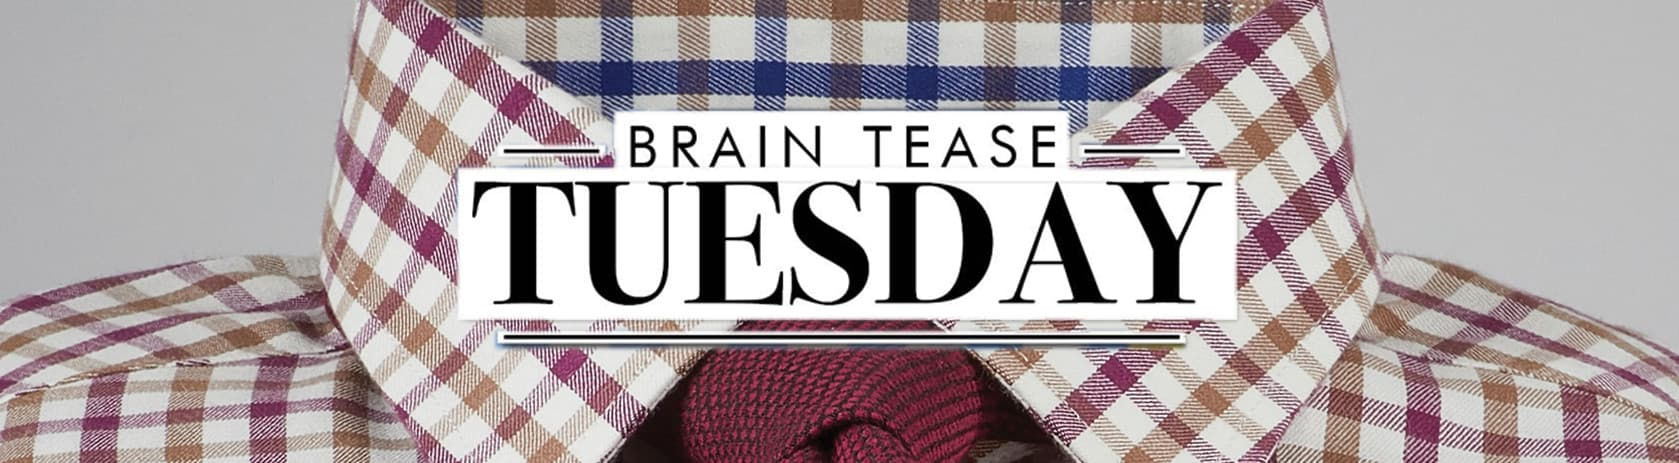 Brain Tease Tuesday Week 48